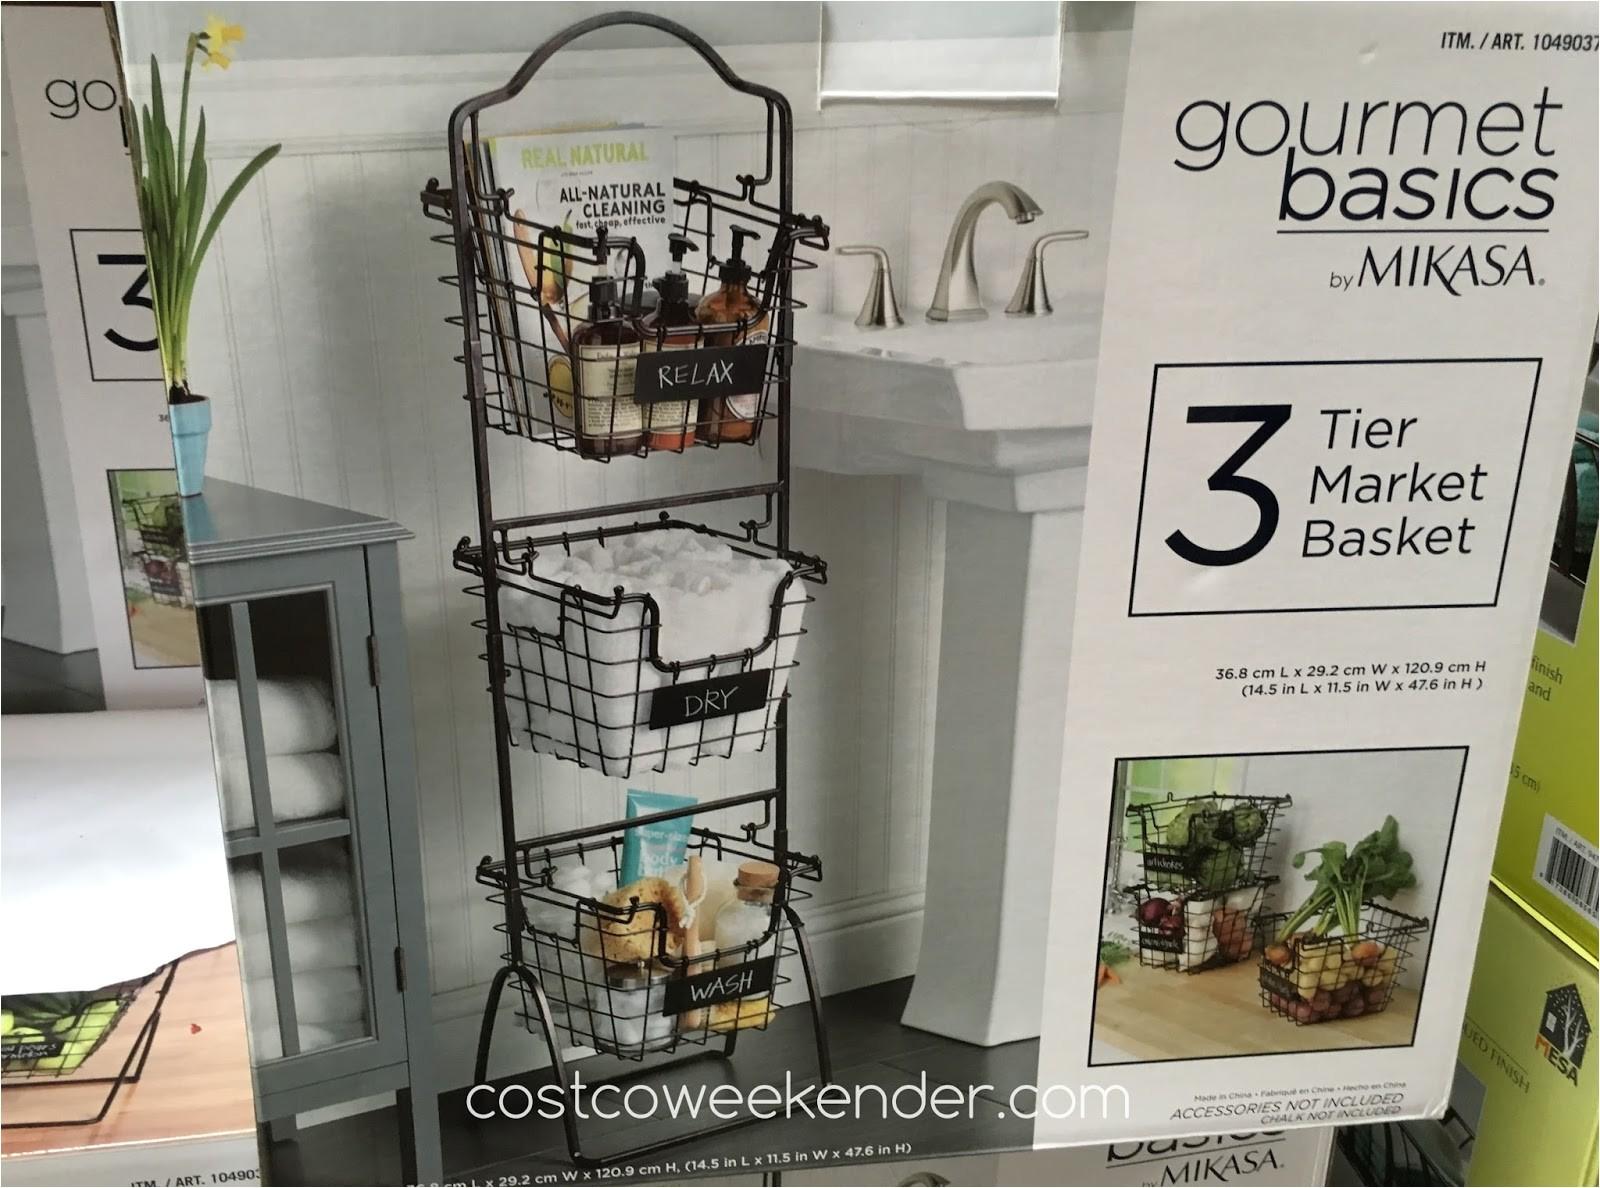 mikasa gourmet basics 3 tier market basket costco 1049037